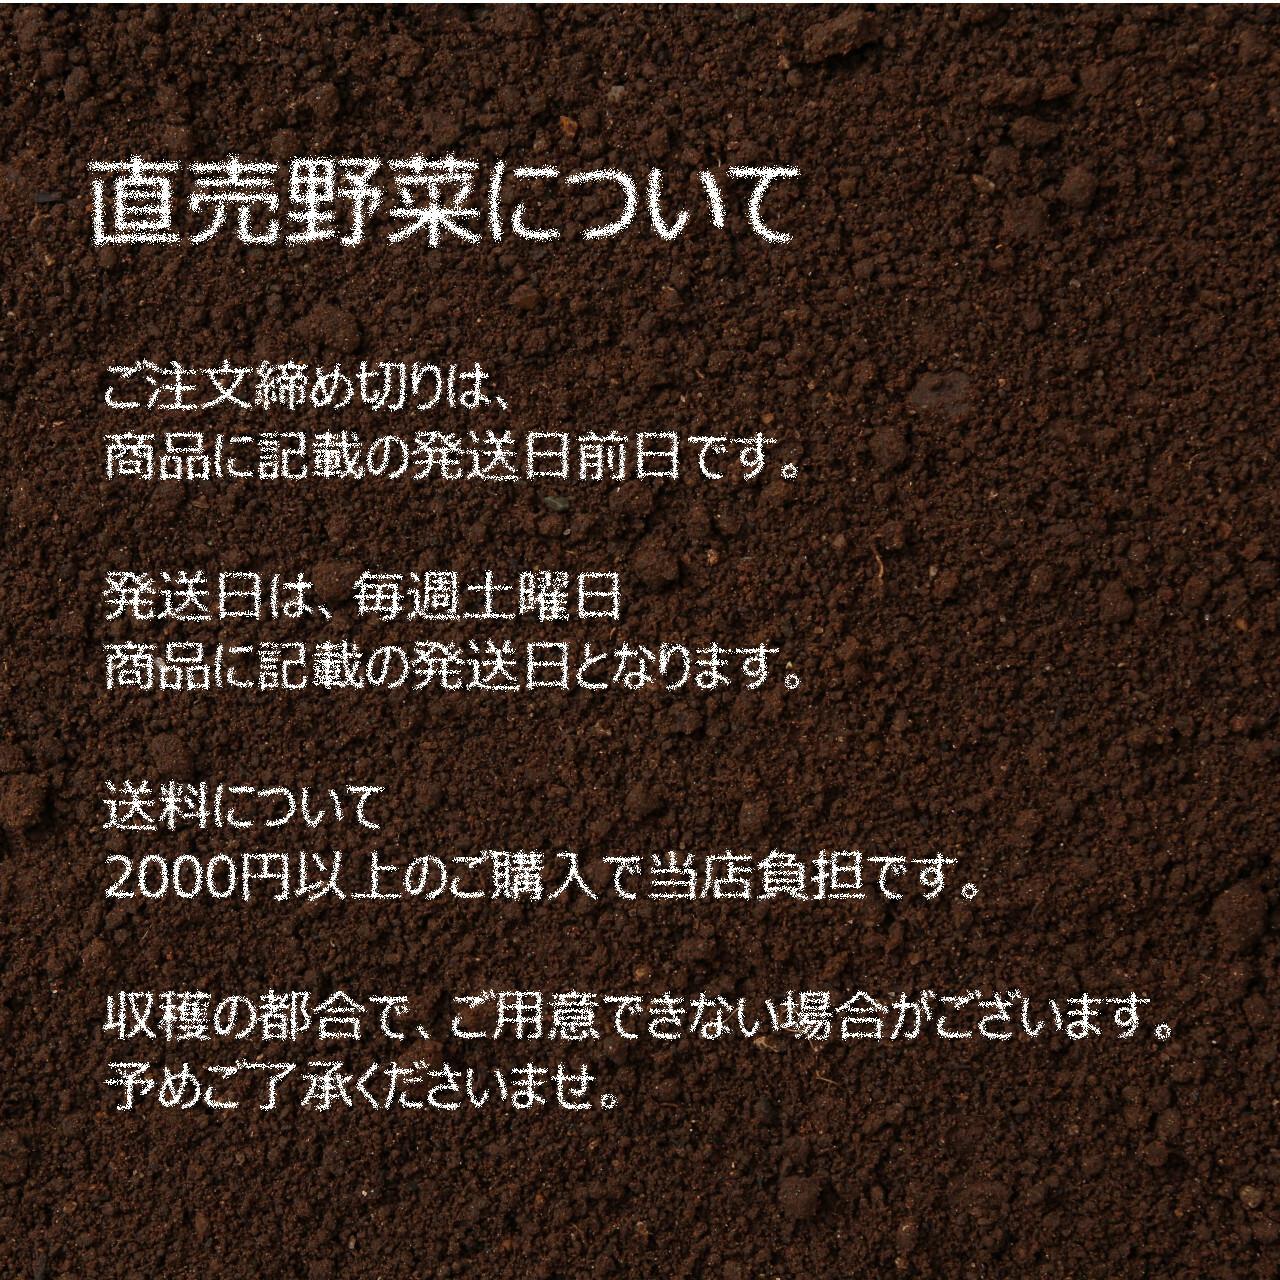 6月の朝採り直売野菜 : 大根 約 1~2本 春の新鮮野菜 6月6日発送予定